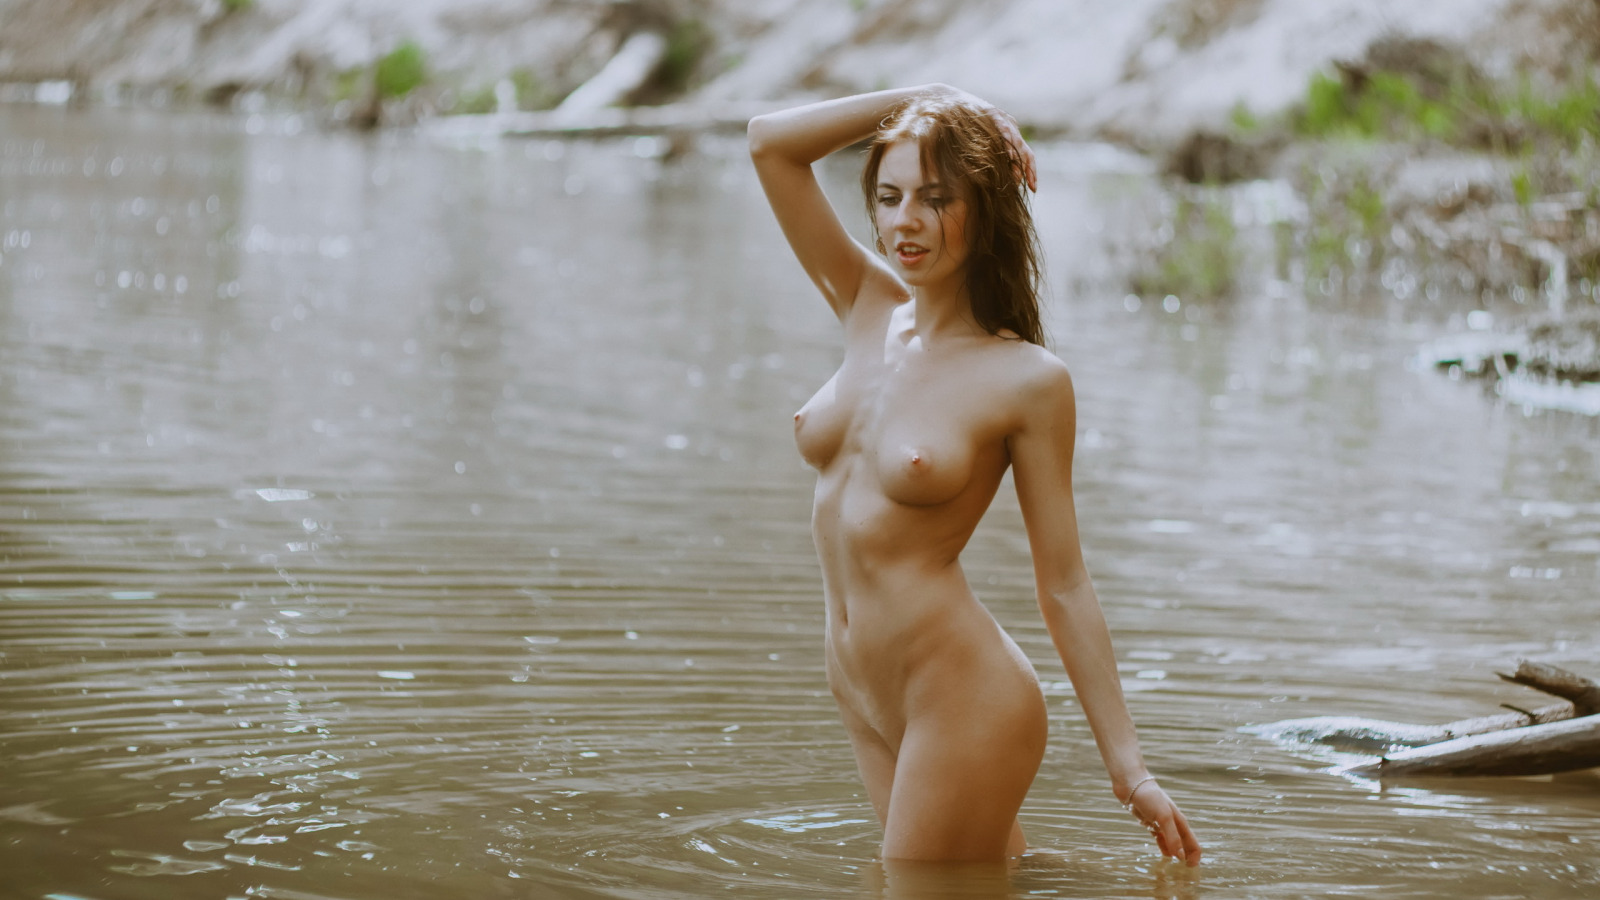 трибунам, футболист девушка на реке эротические фото мастурбации